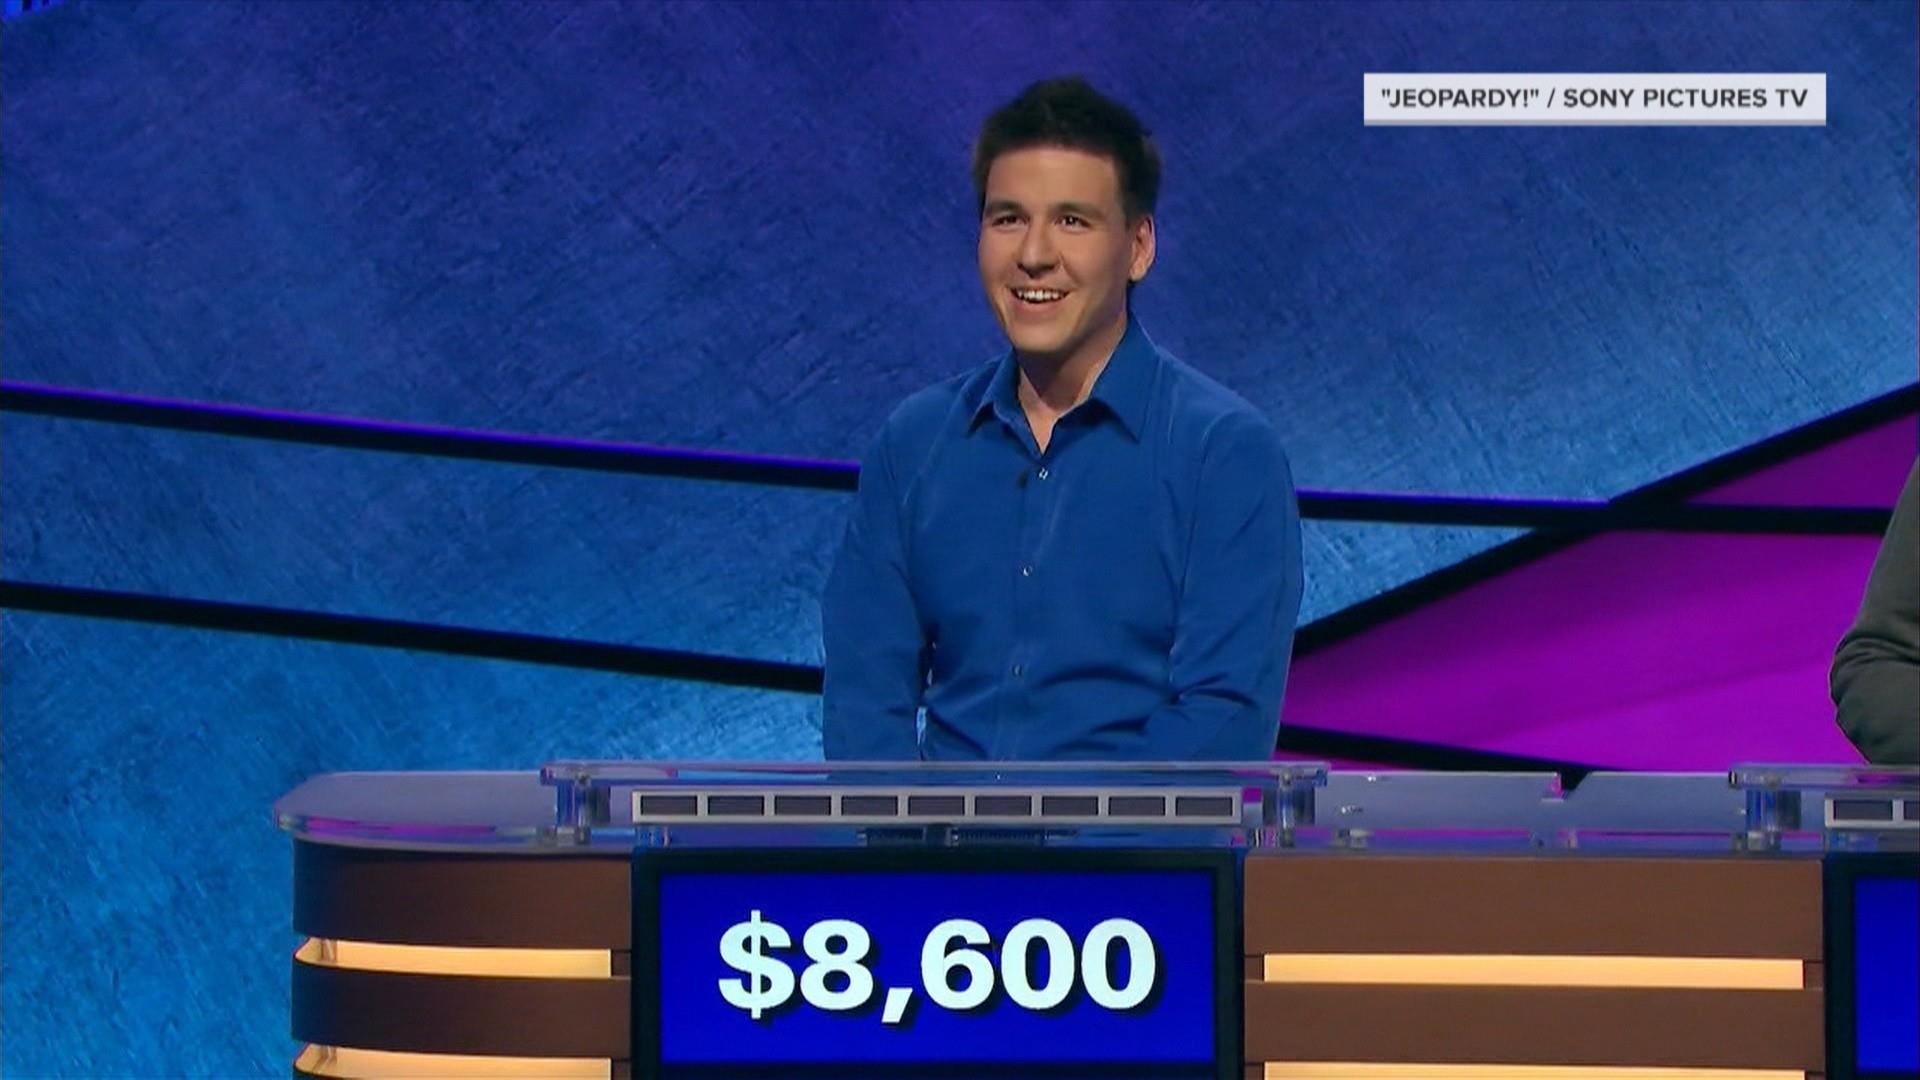 'Jeopardy' sensation James Holzhauer surpasses $2 million mark